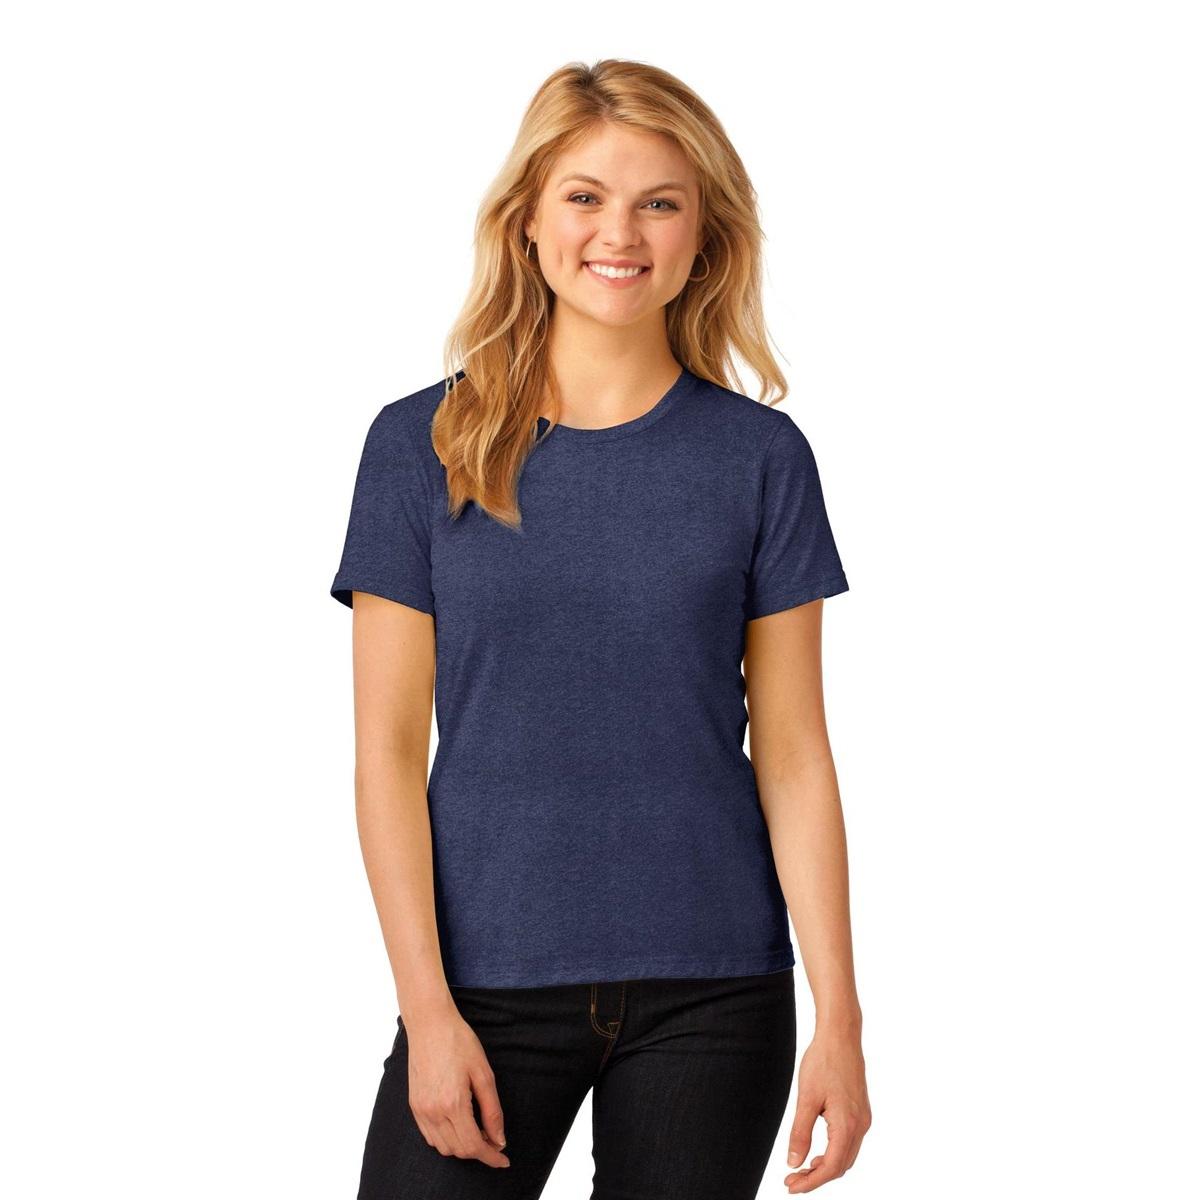 Anvil 880 Ladies Ring Spun Cotton T Shirt Heather Blue